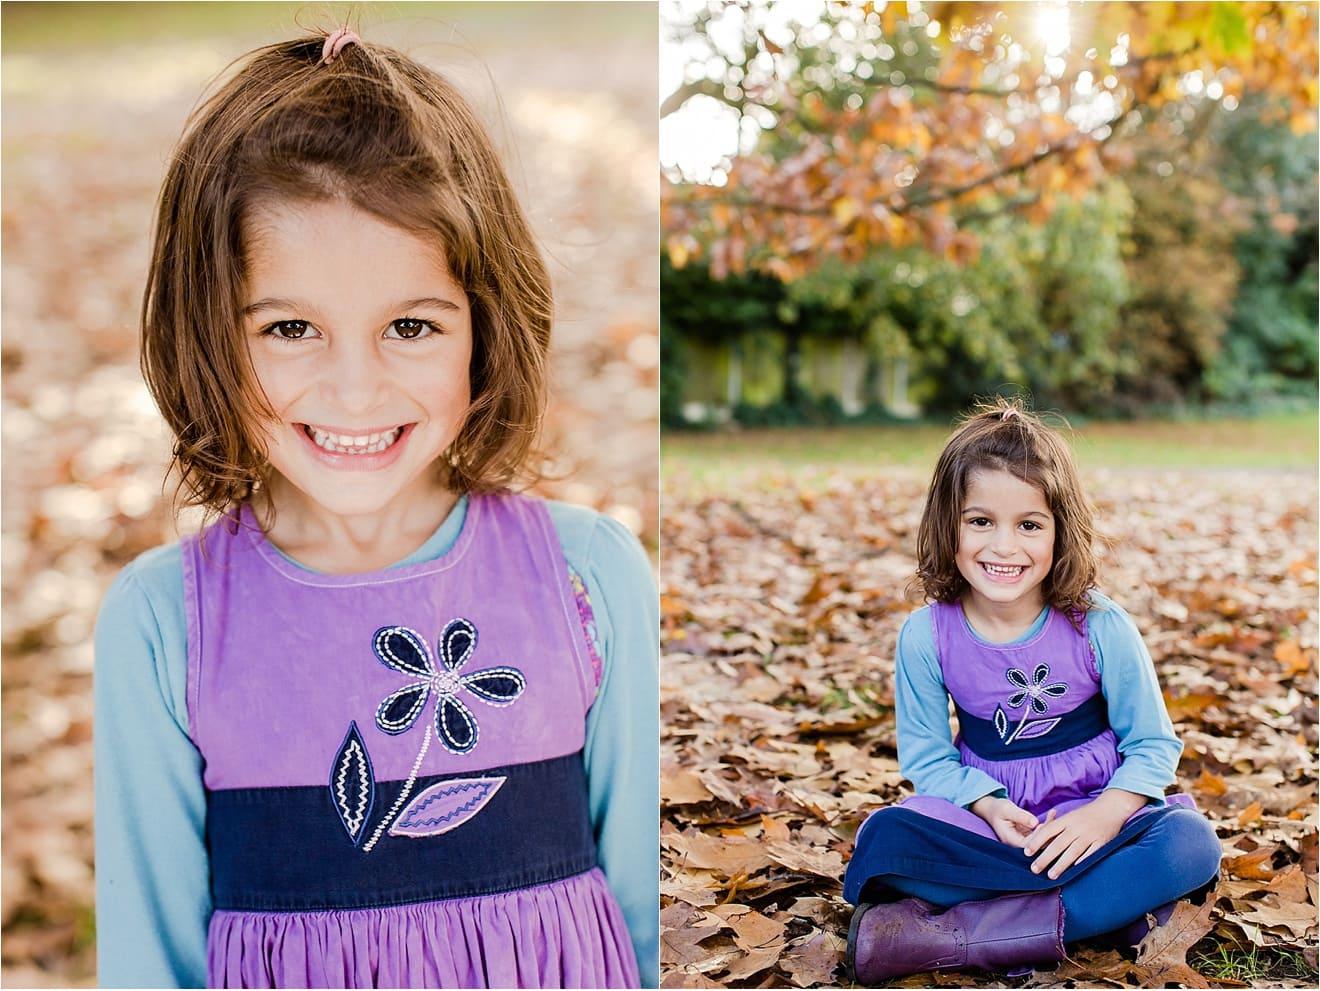 013_family-photography-surrey-autumn-mini-session-eddie-judd-photographer_9679